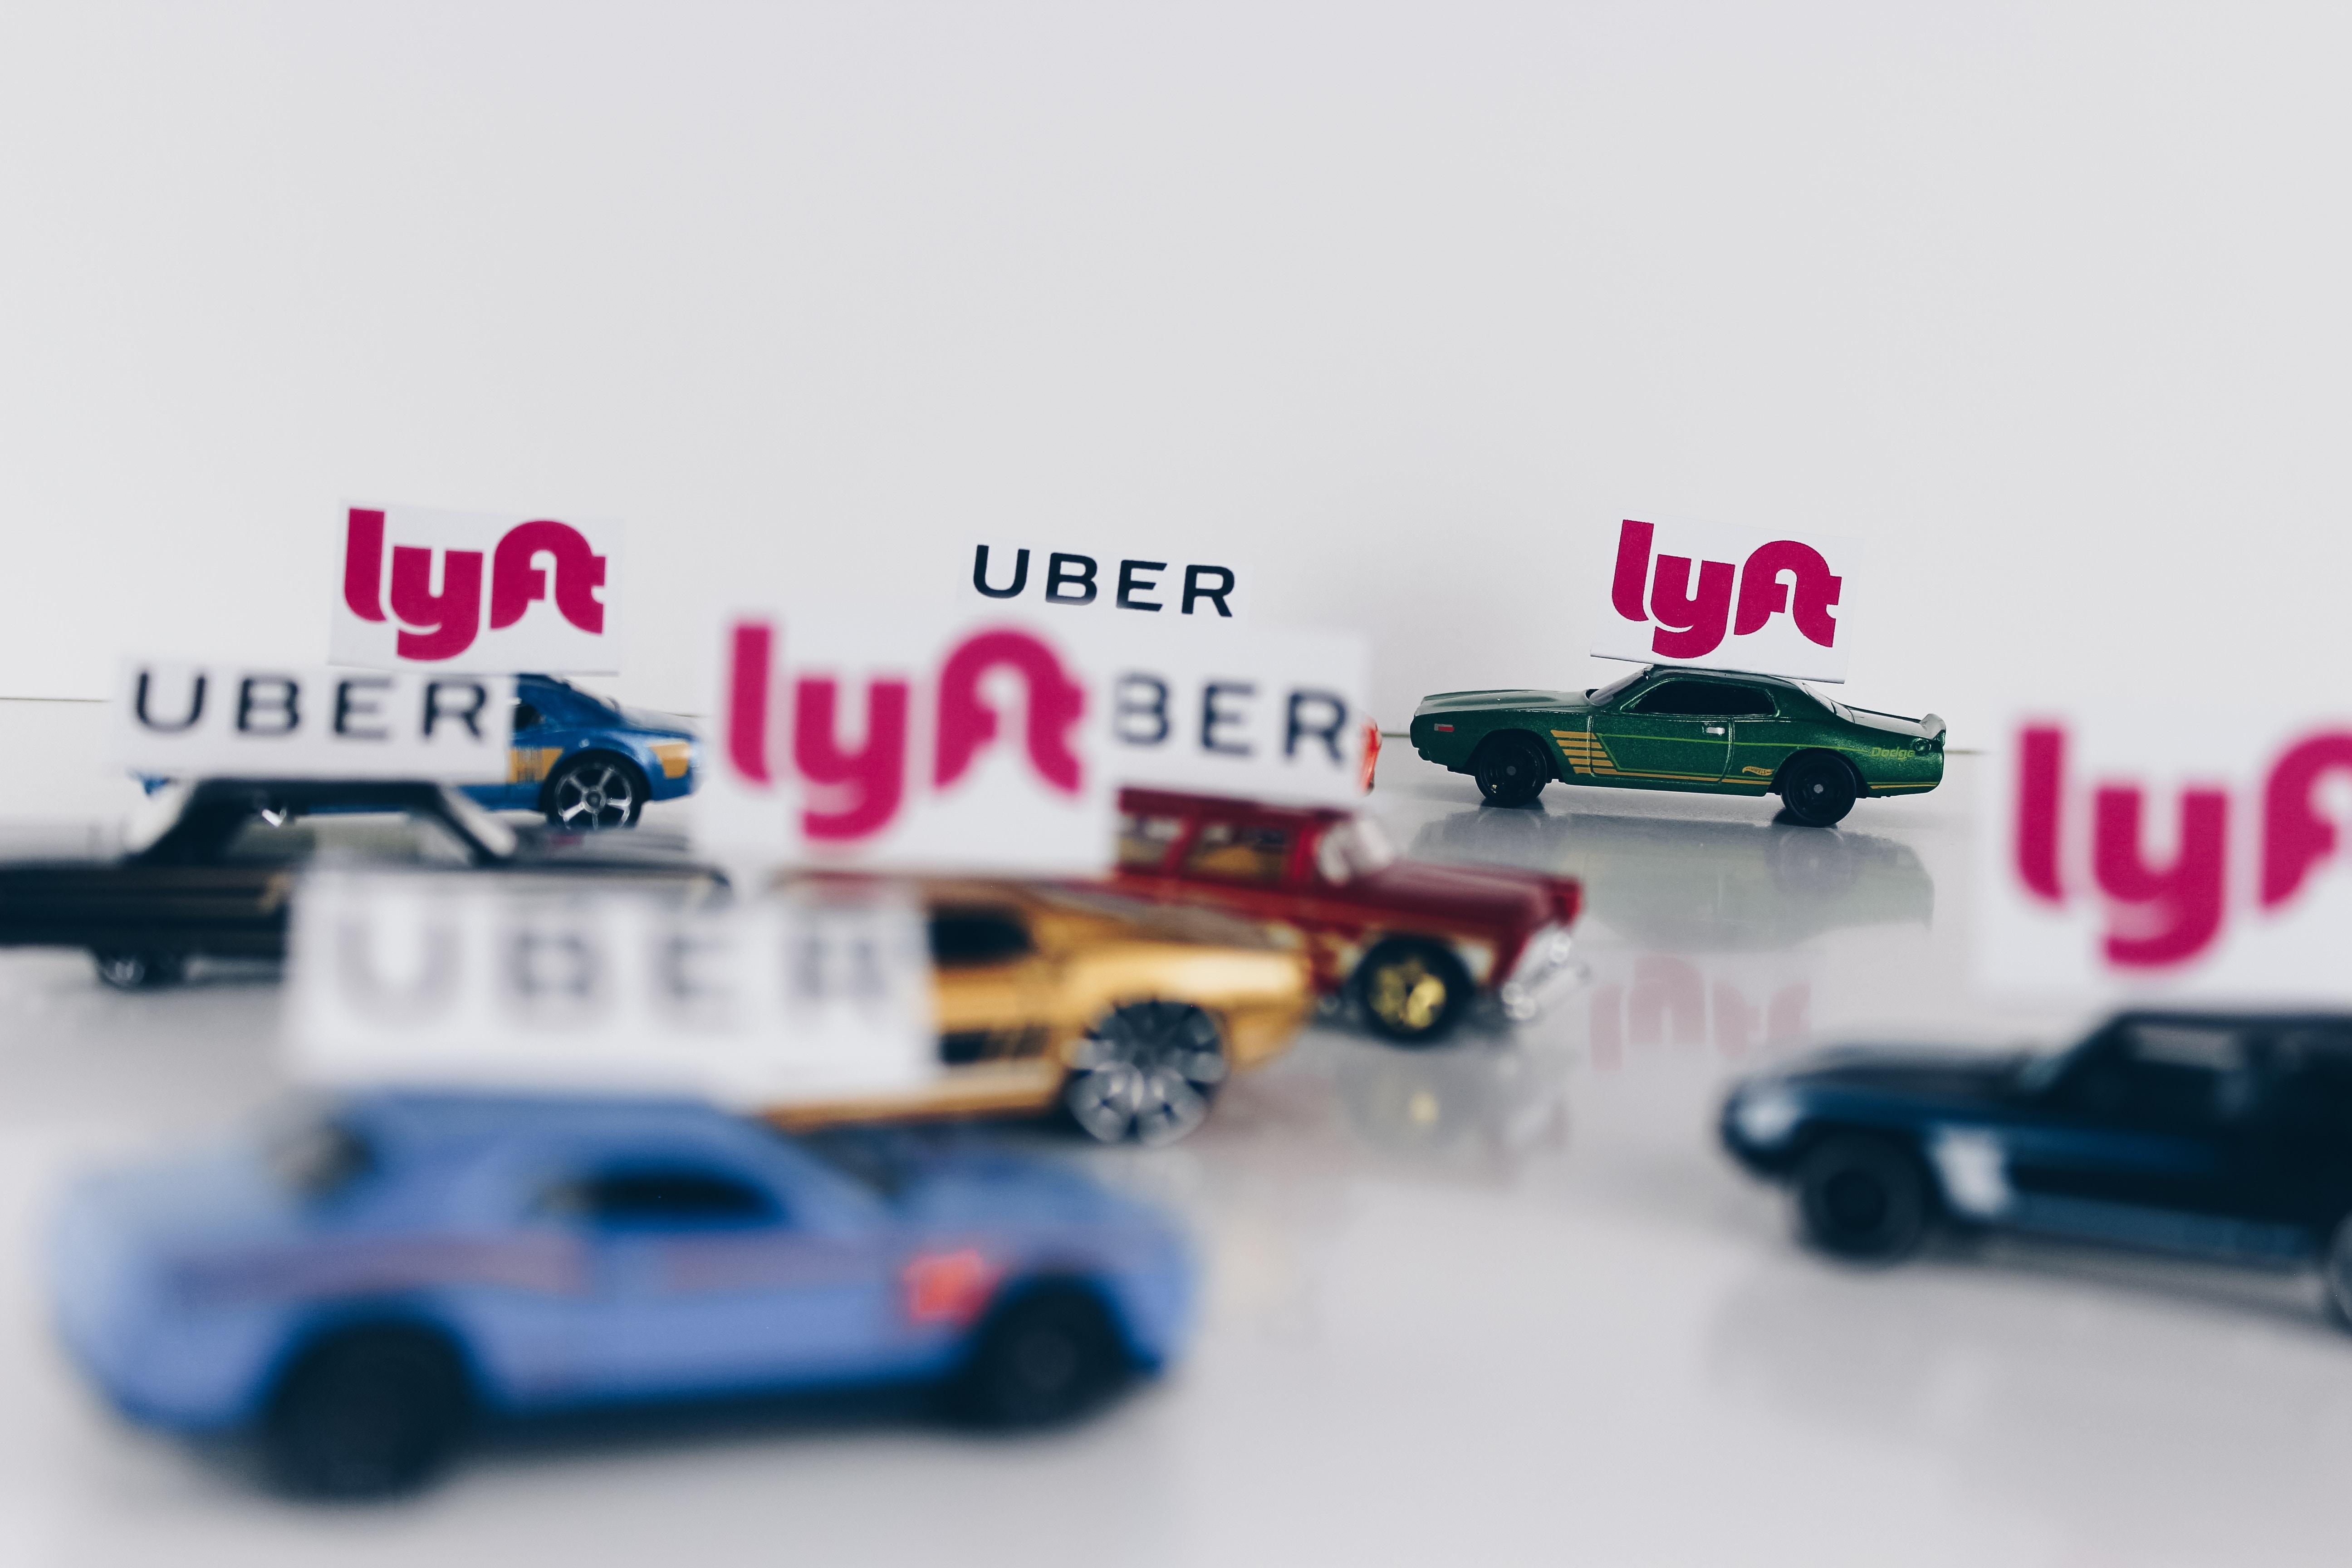 Uber and Lyft go public